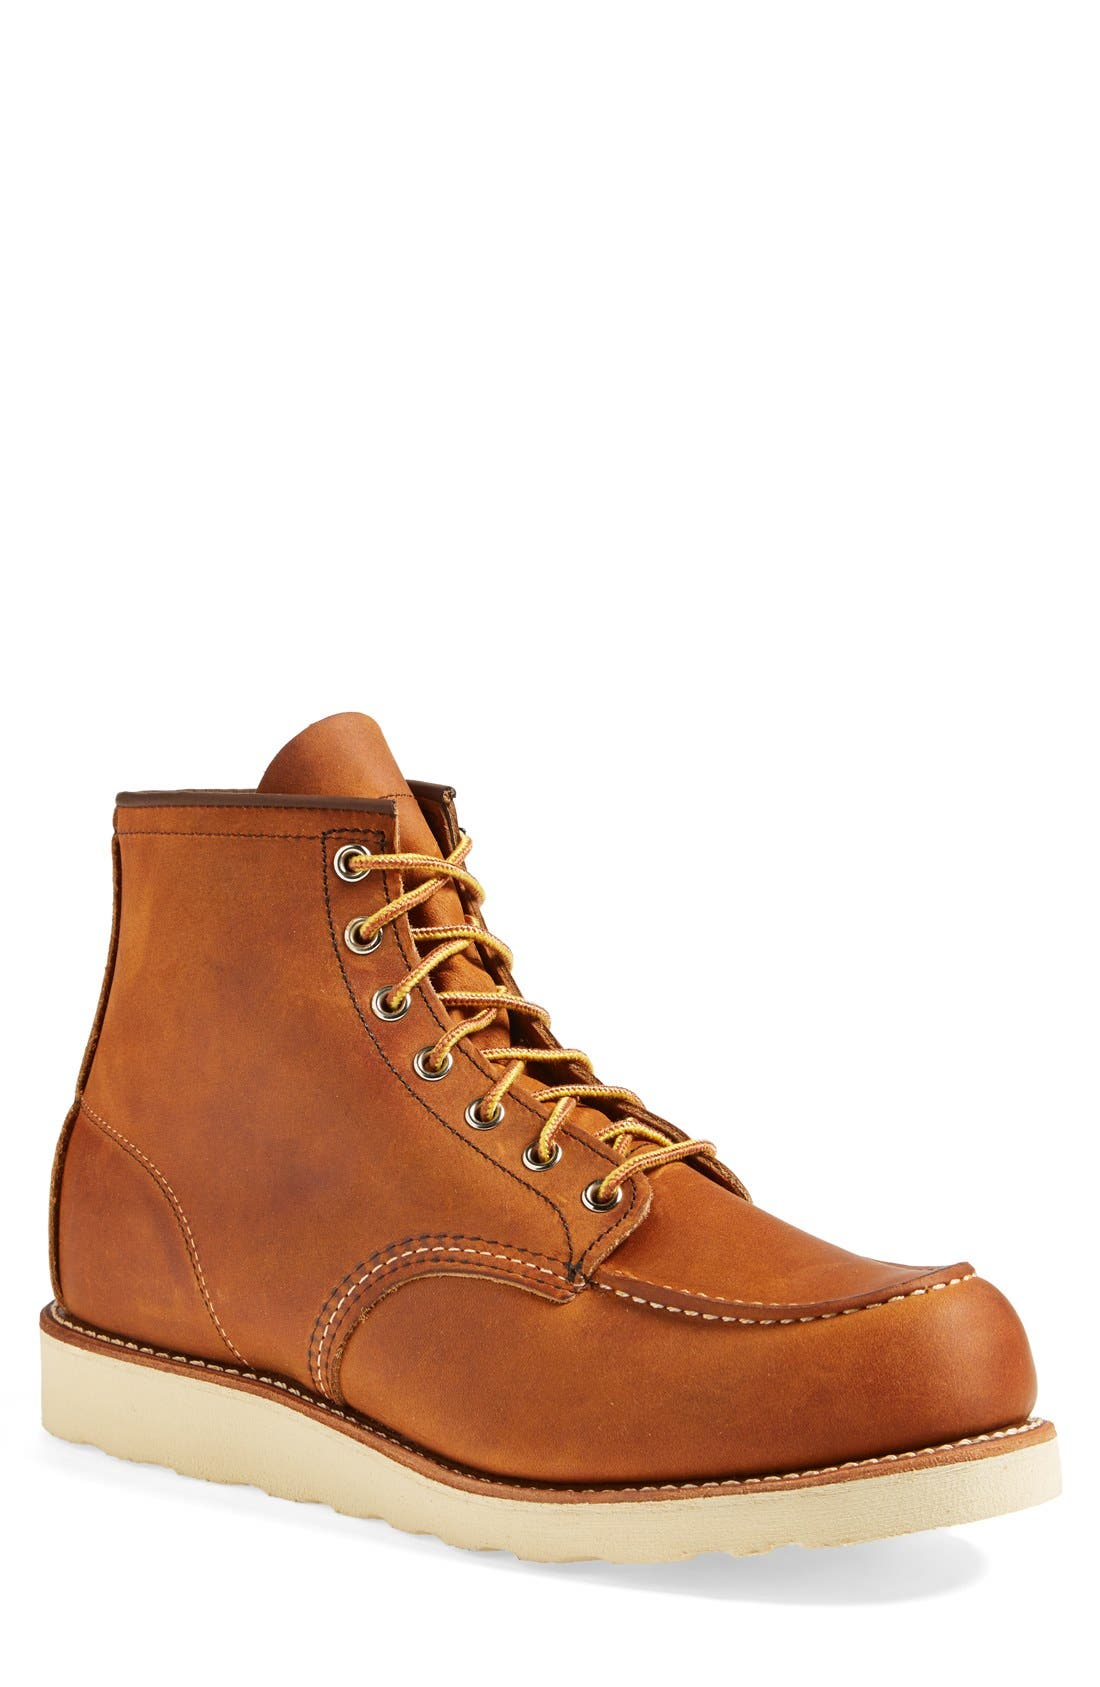 Moc Toe Boot,                             Main thumbnail 1, color,                             Copper Yuma